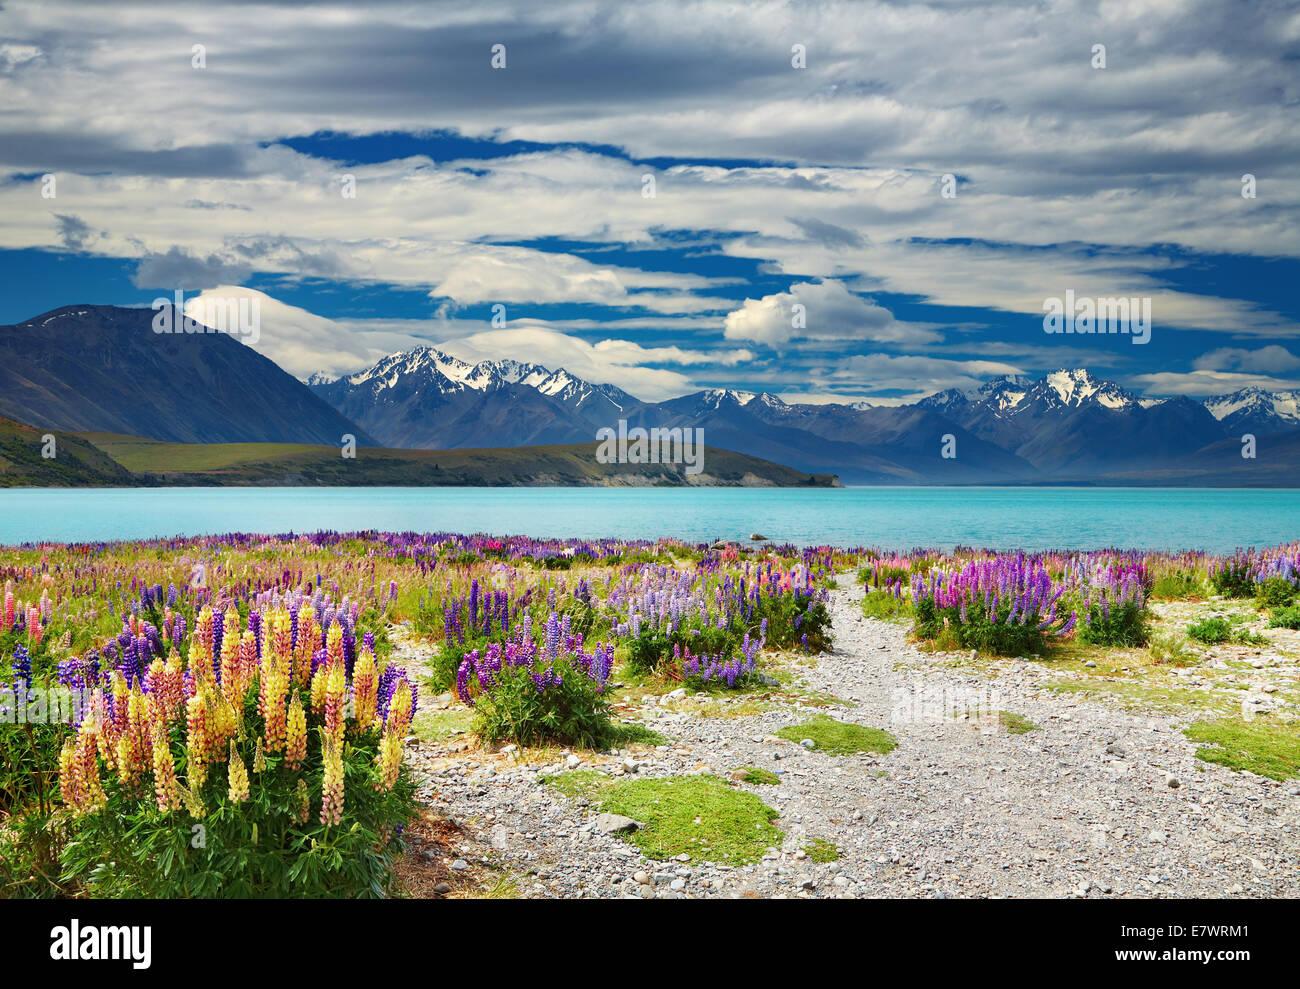 Lago Tekapo, Alpi del Sud, Nuova Zelanda Immagini Stock